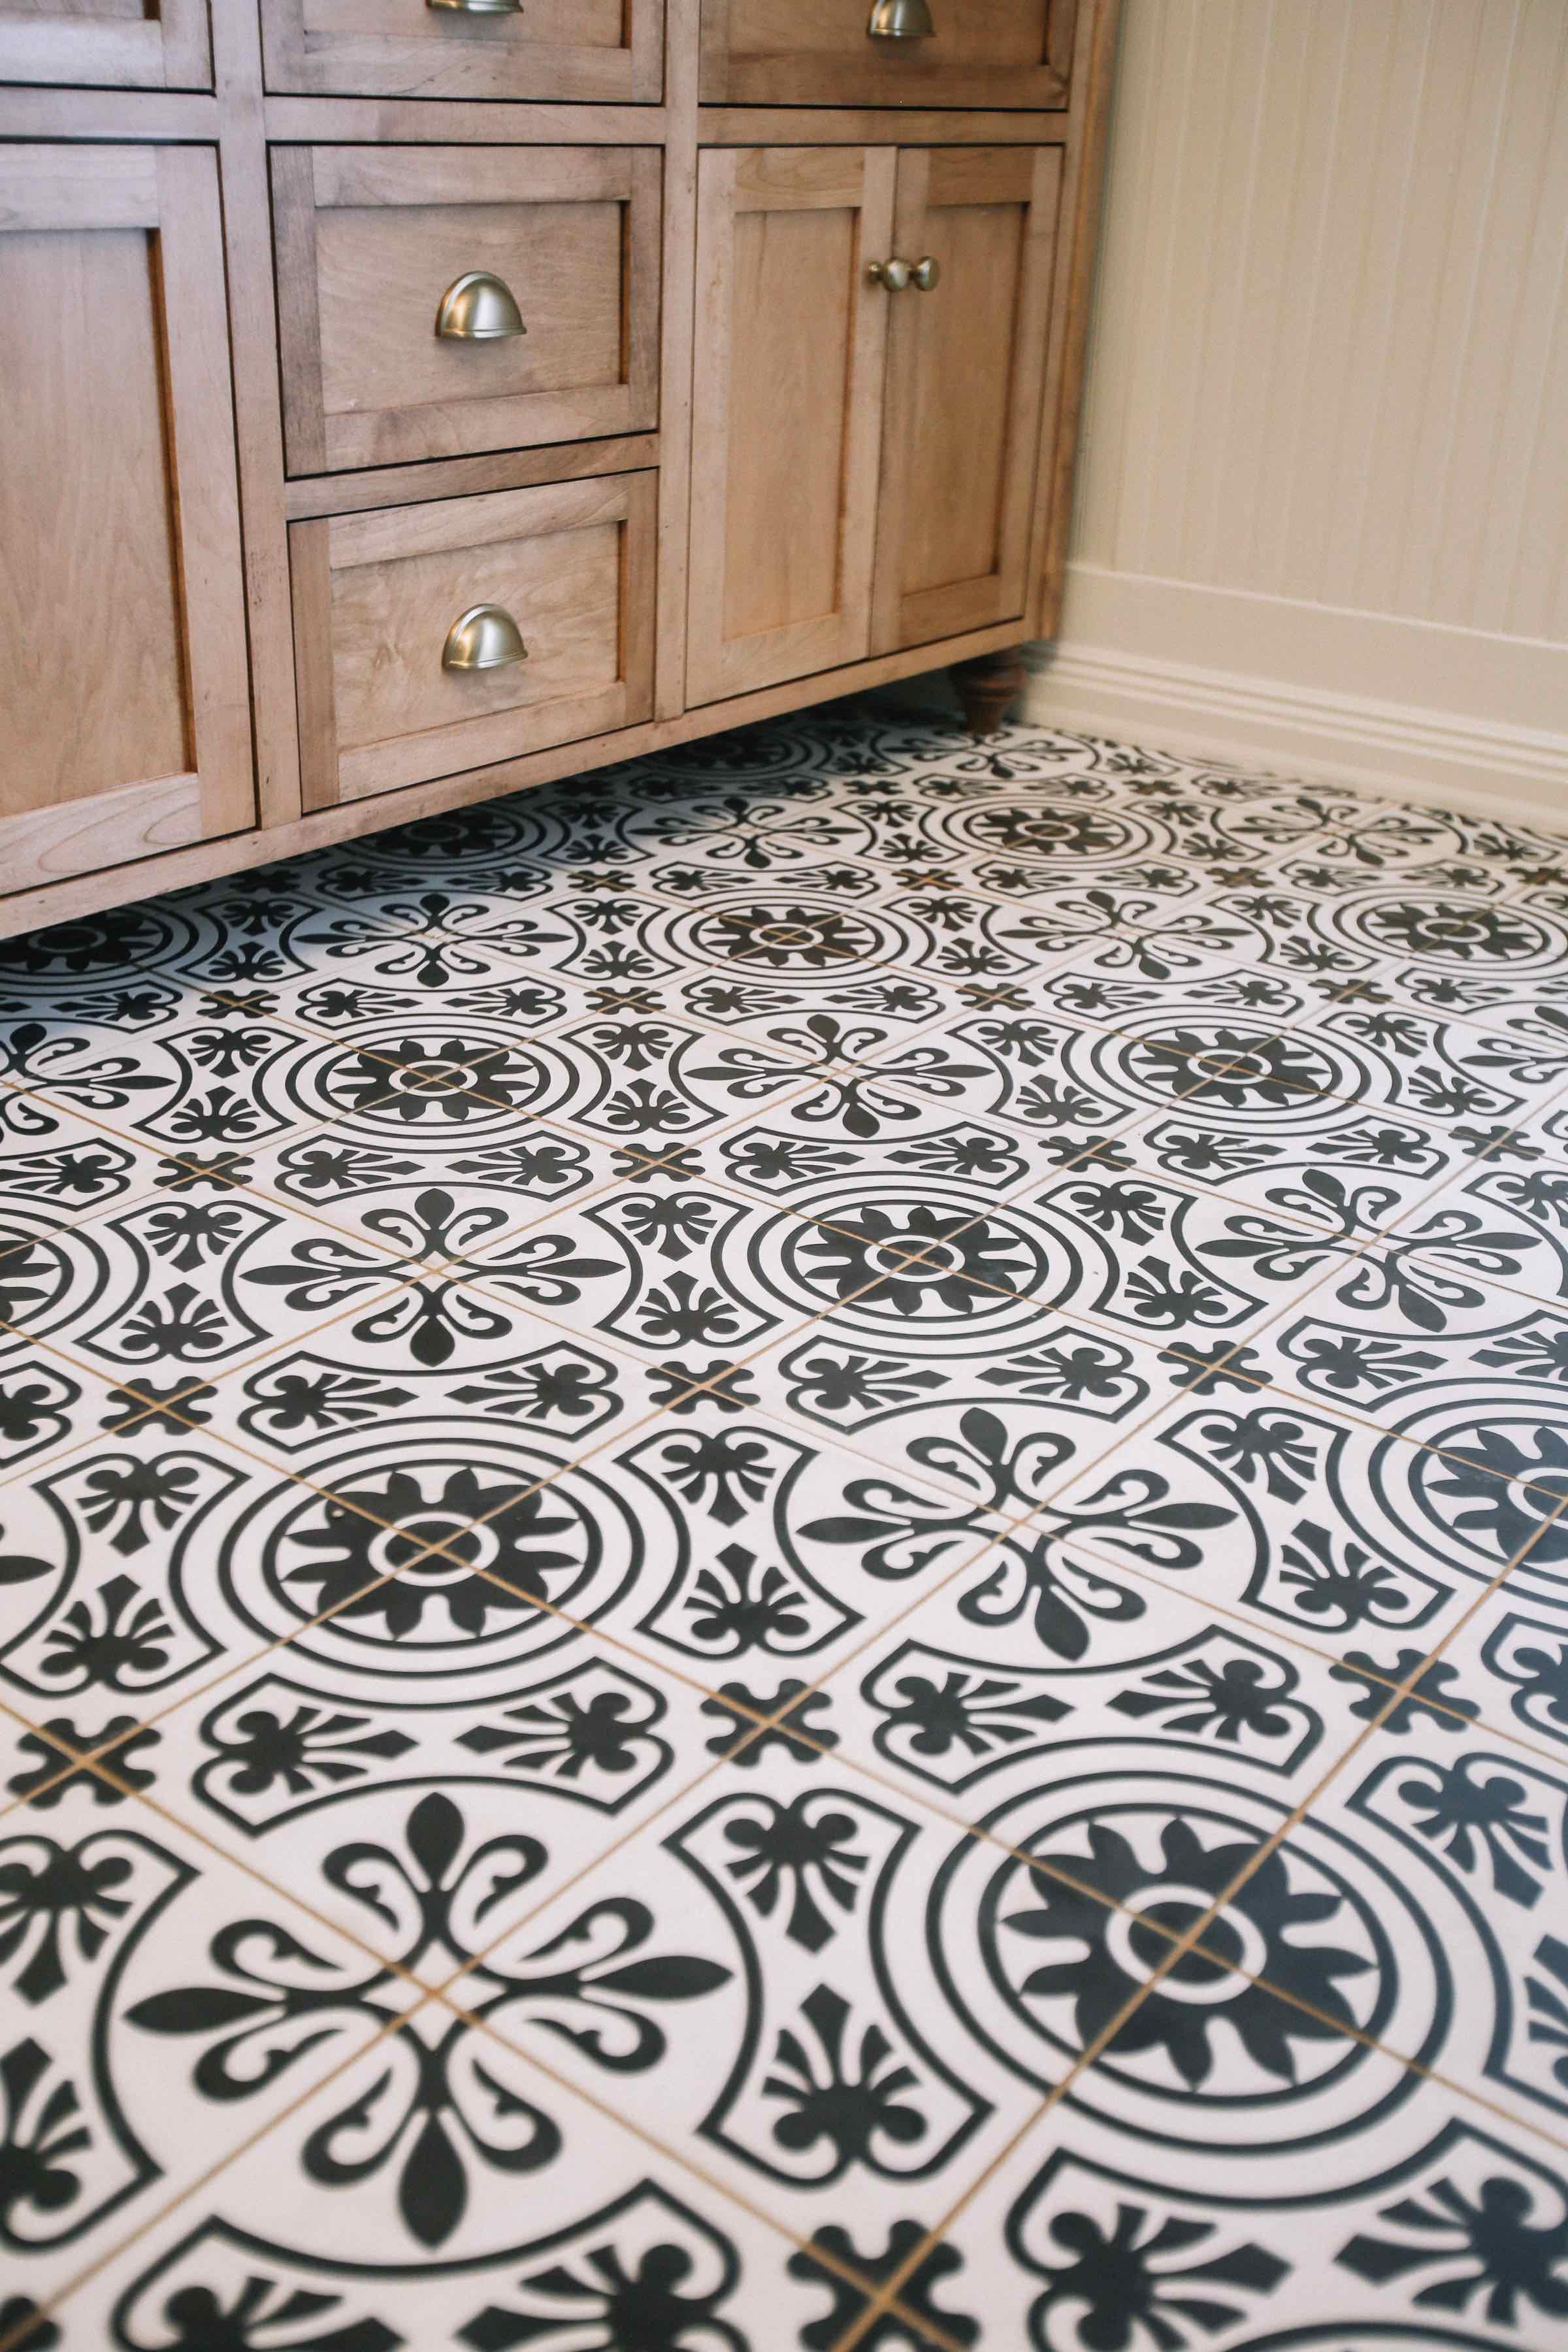 Patterned-tile-in-a-bathroom-remodel.jpg